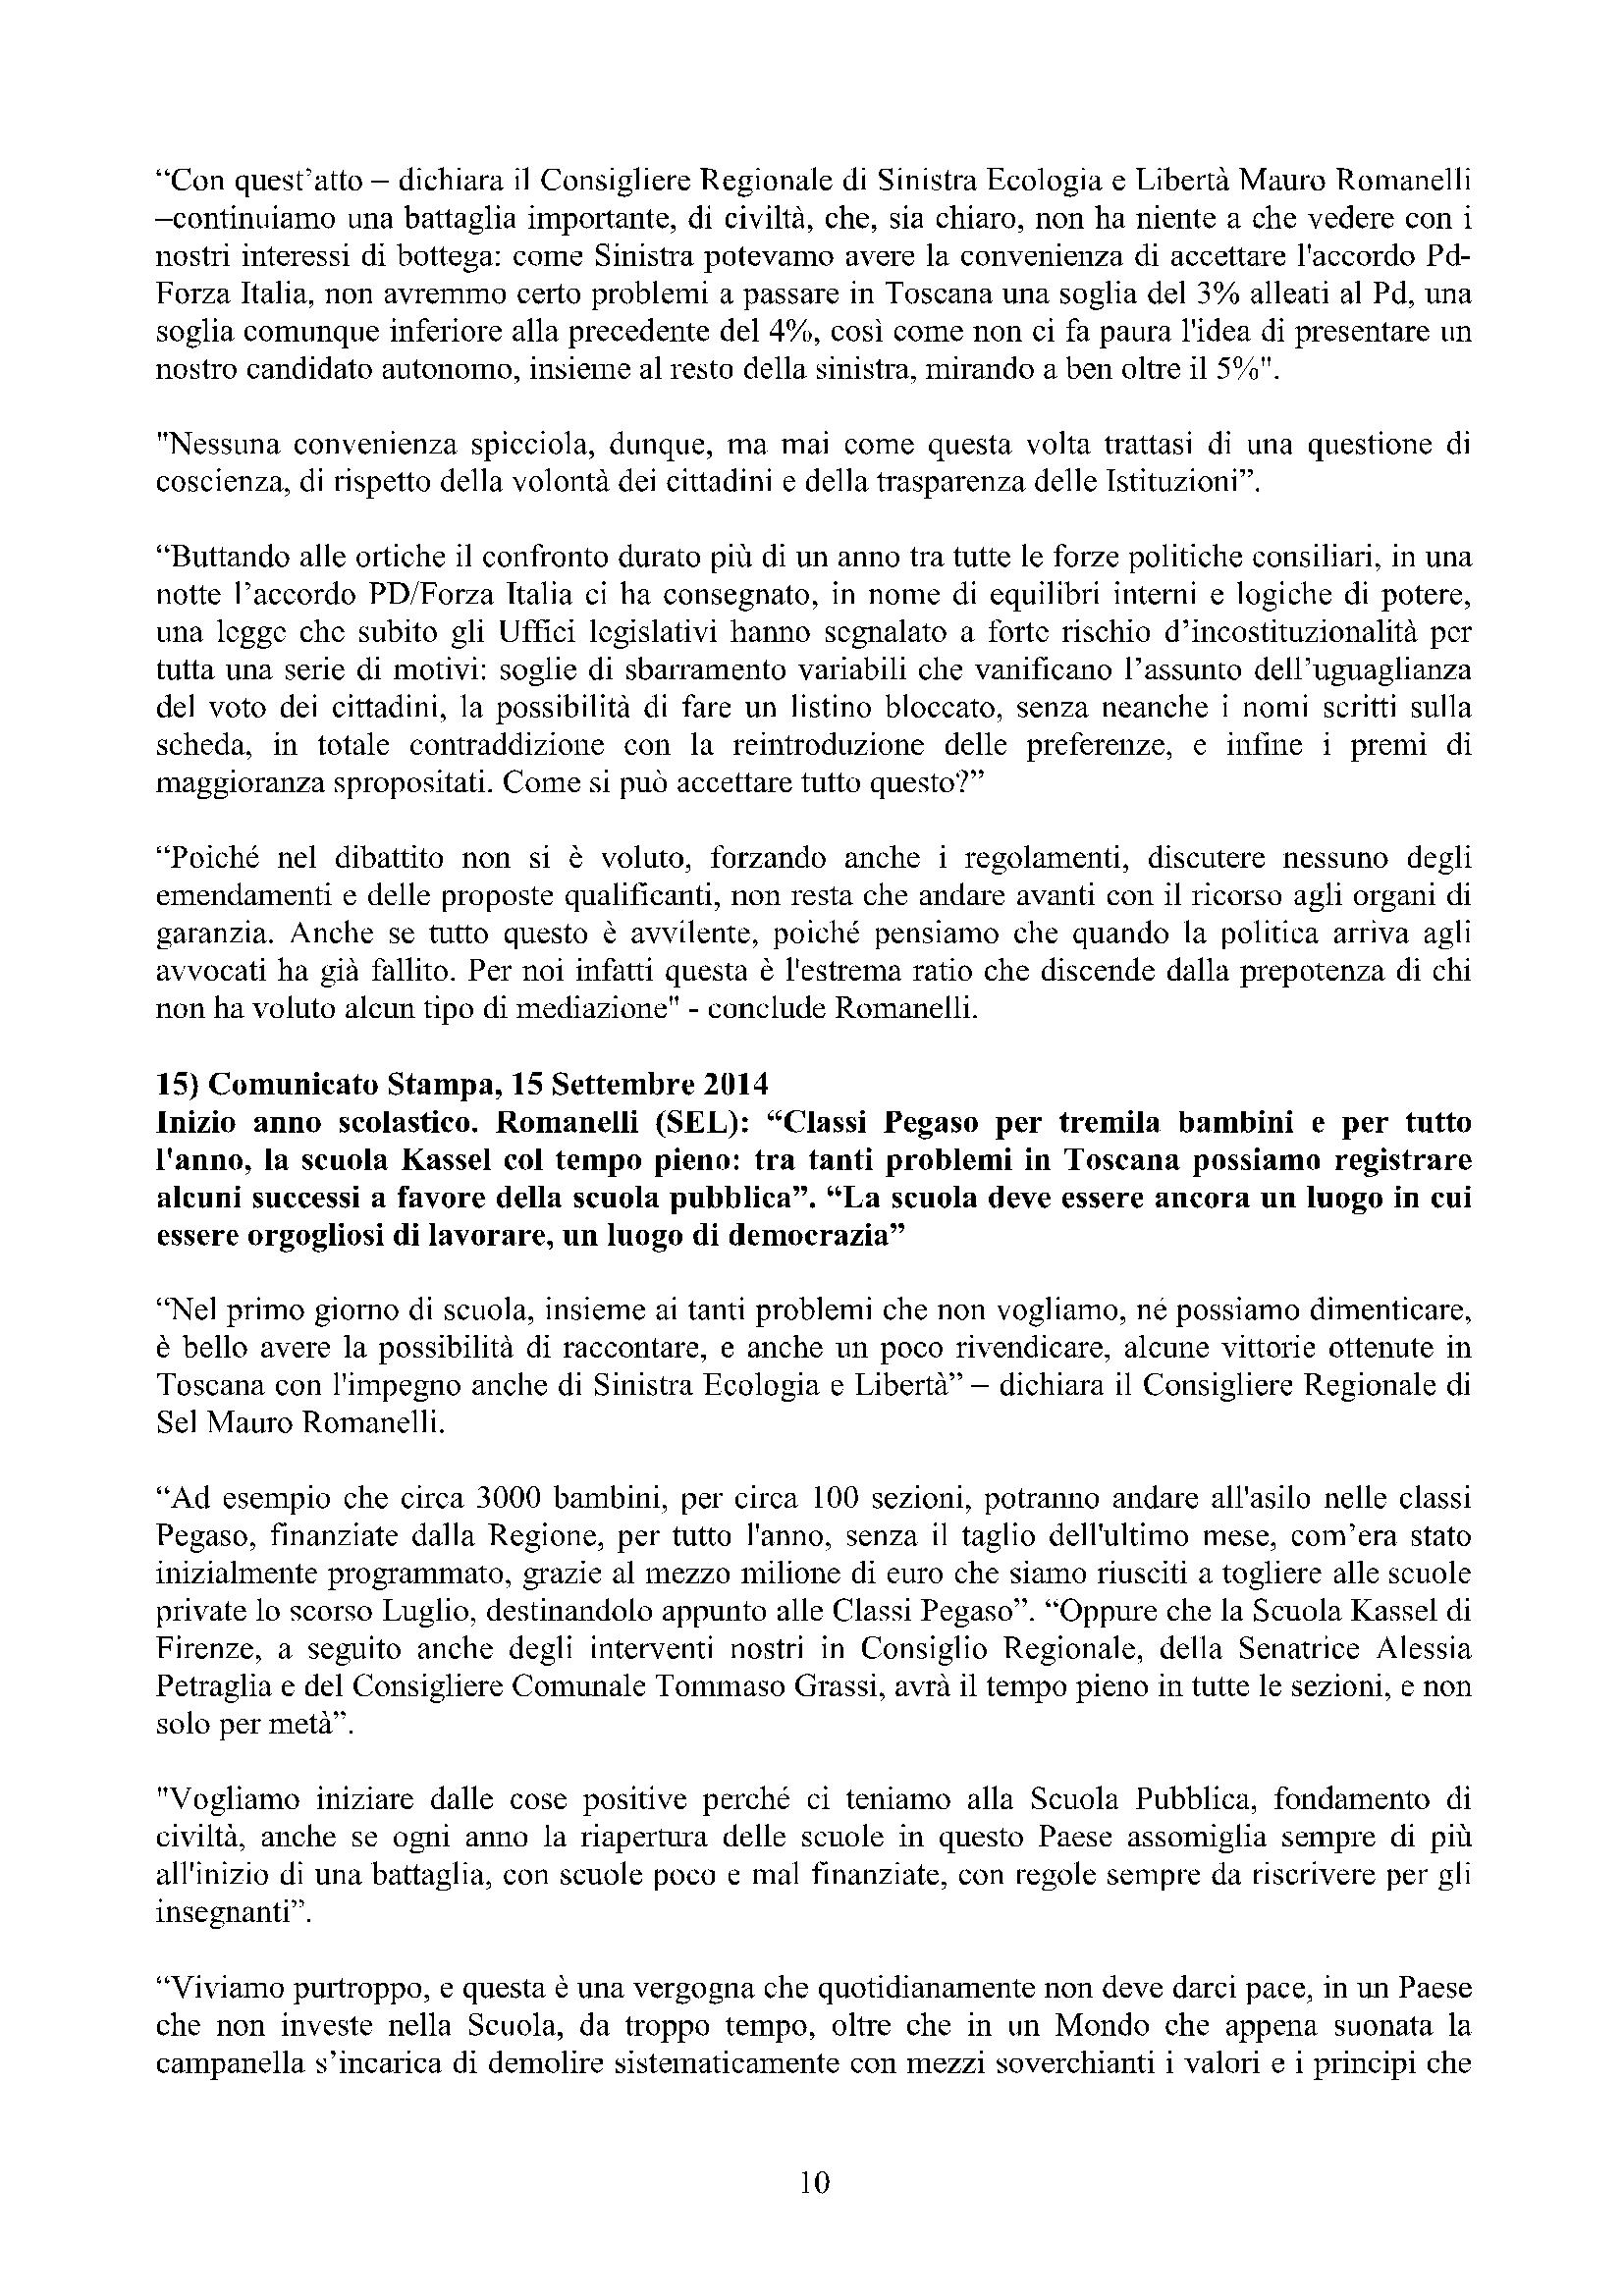 Newsletter di MAURO ROMANELLI Ottobre 2014 – 10